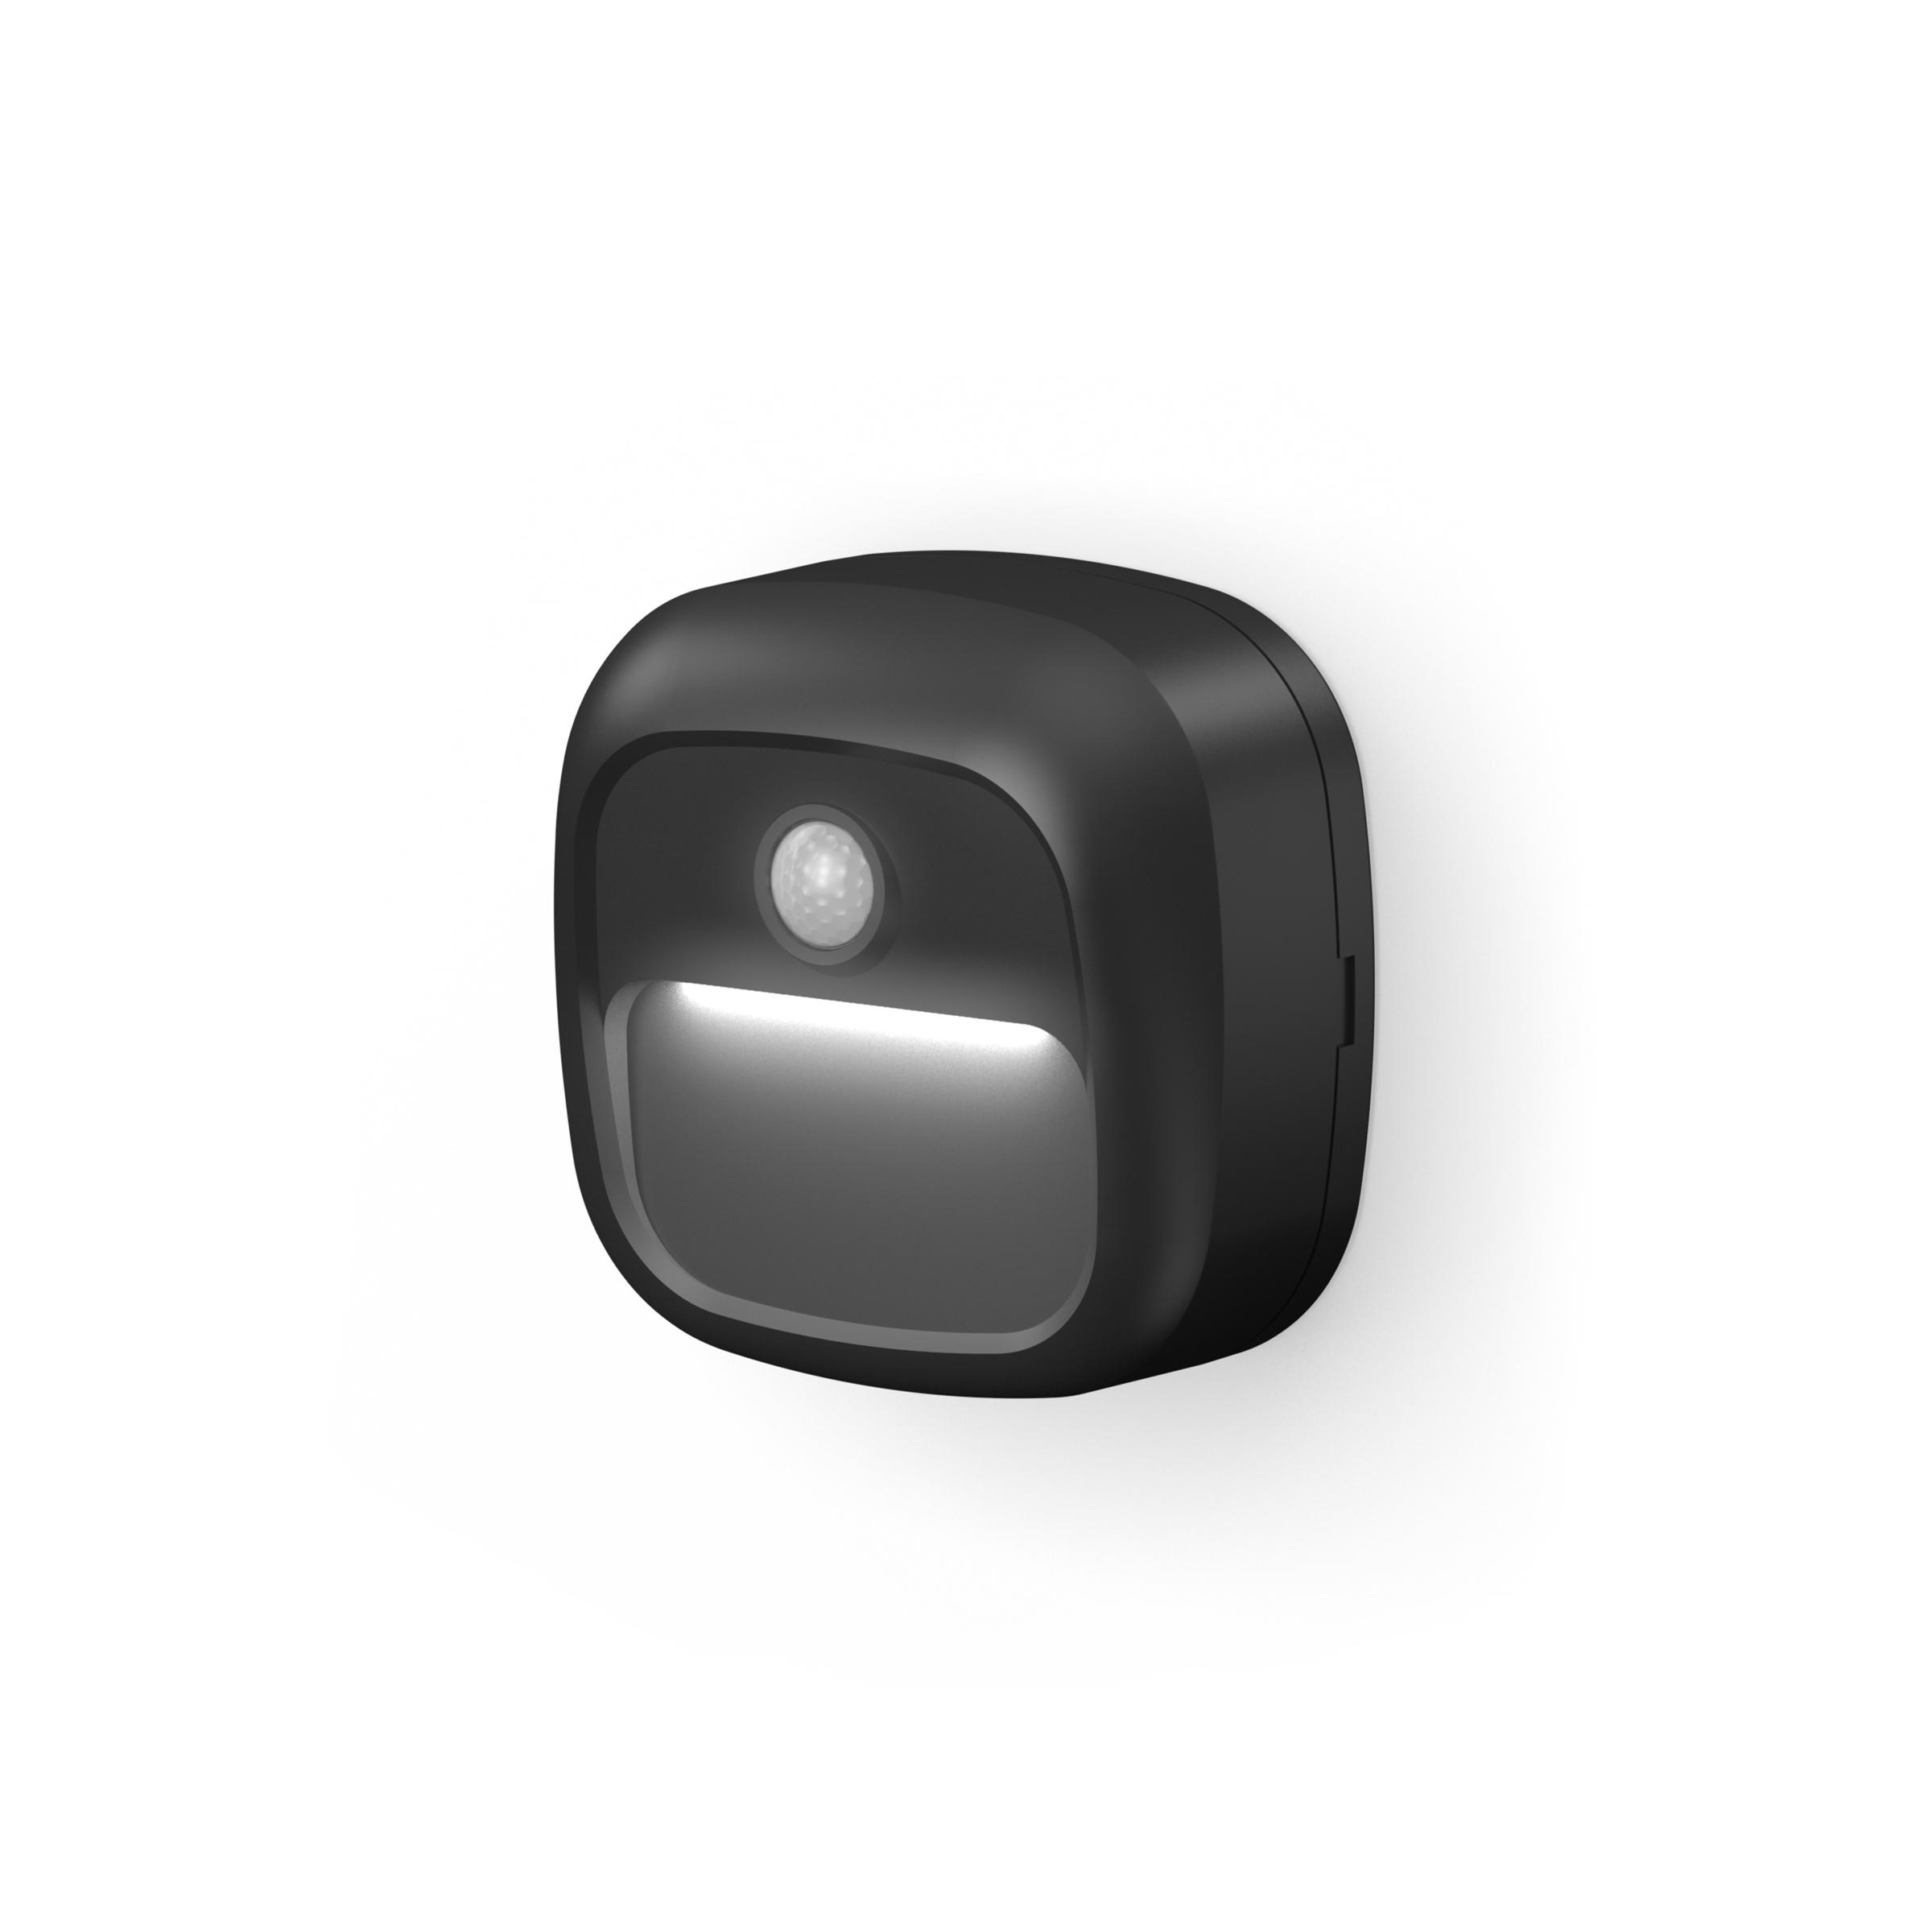 Ring From Video Doorbells To Smart Home Lighting The Verge